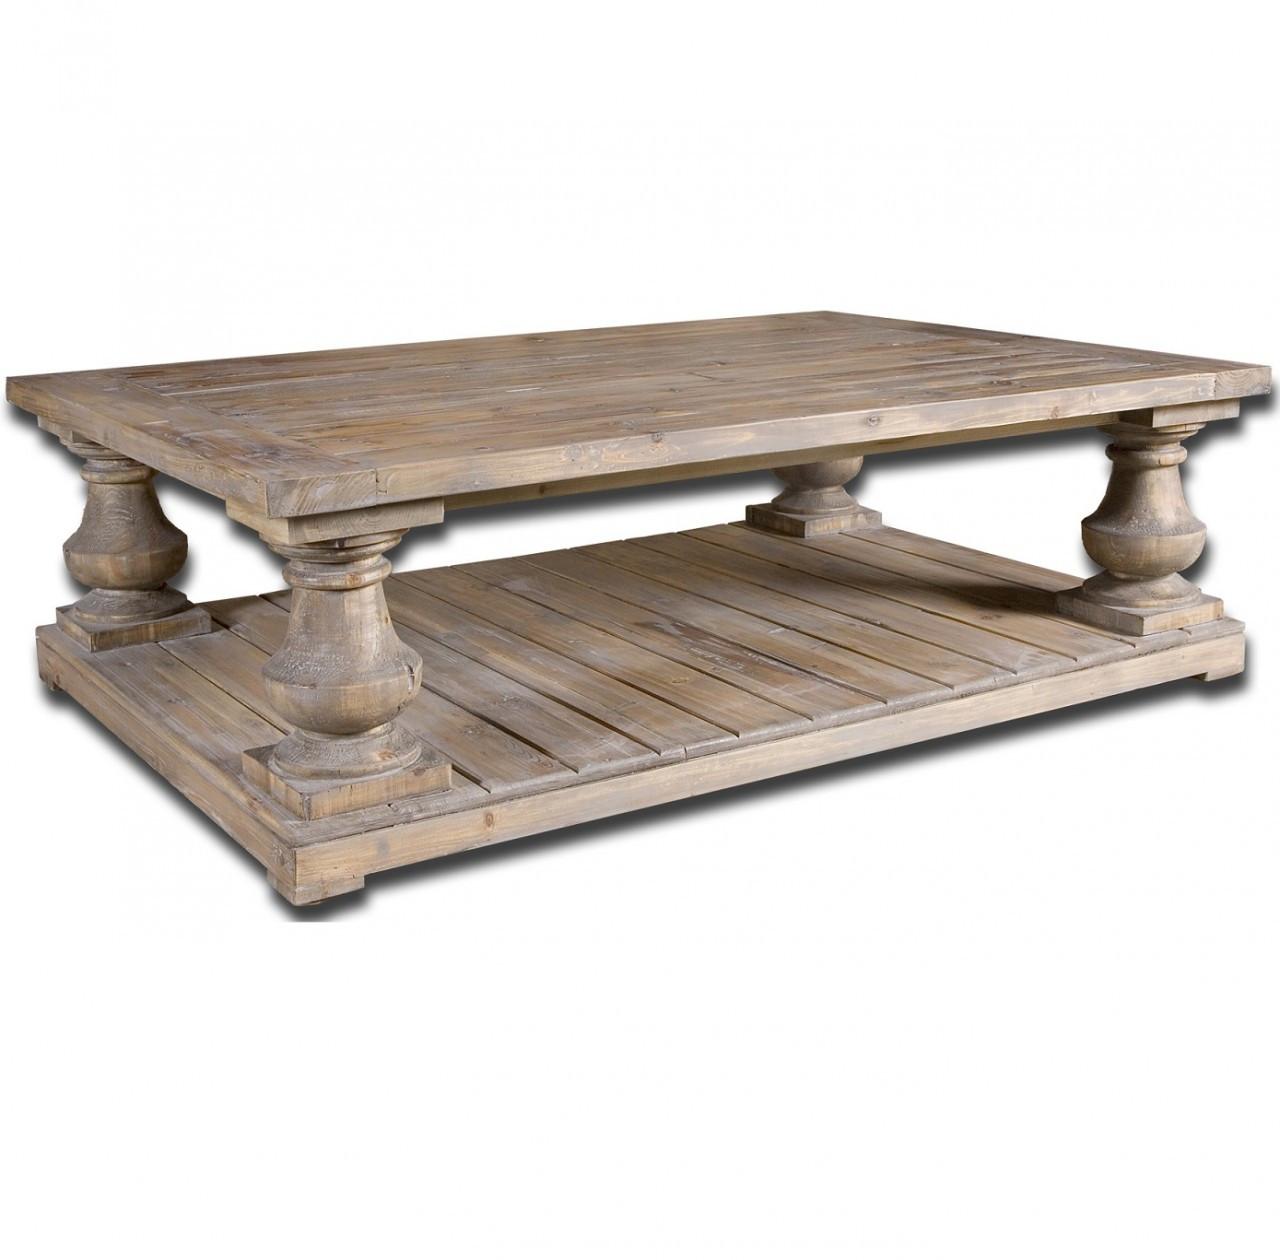 salvaged wood rustic coffee table 60